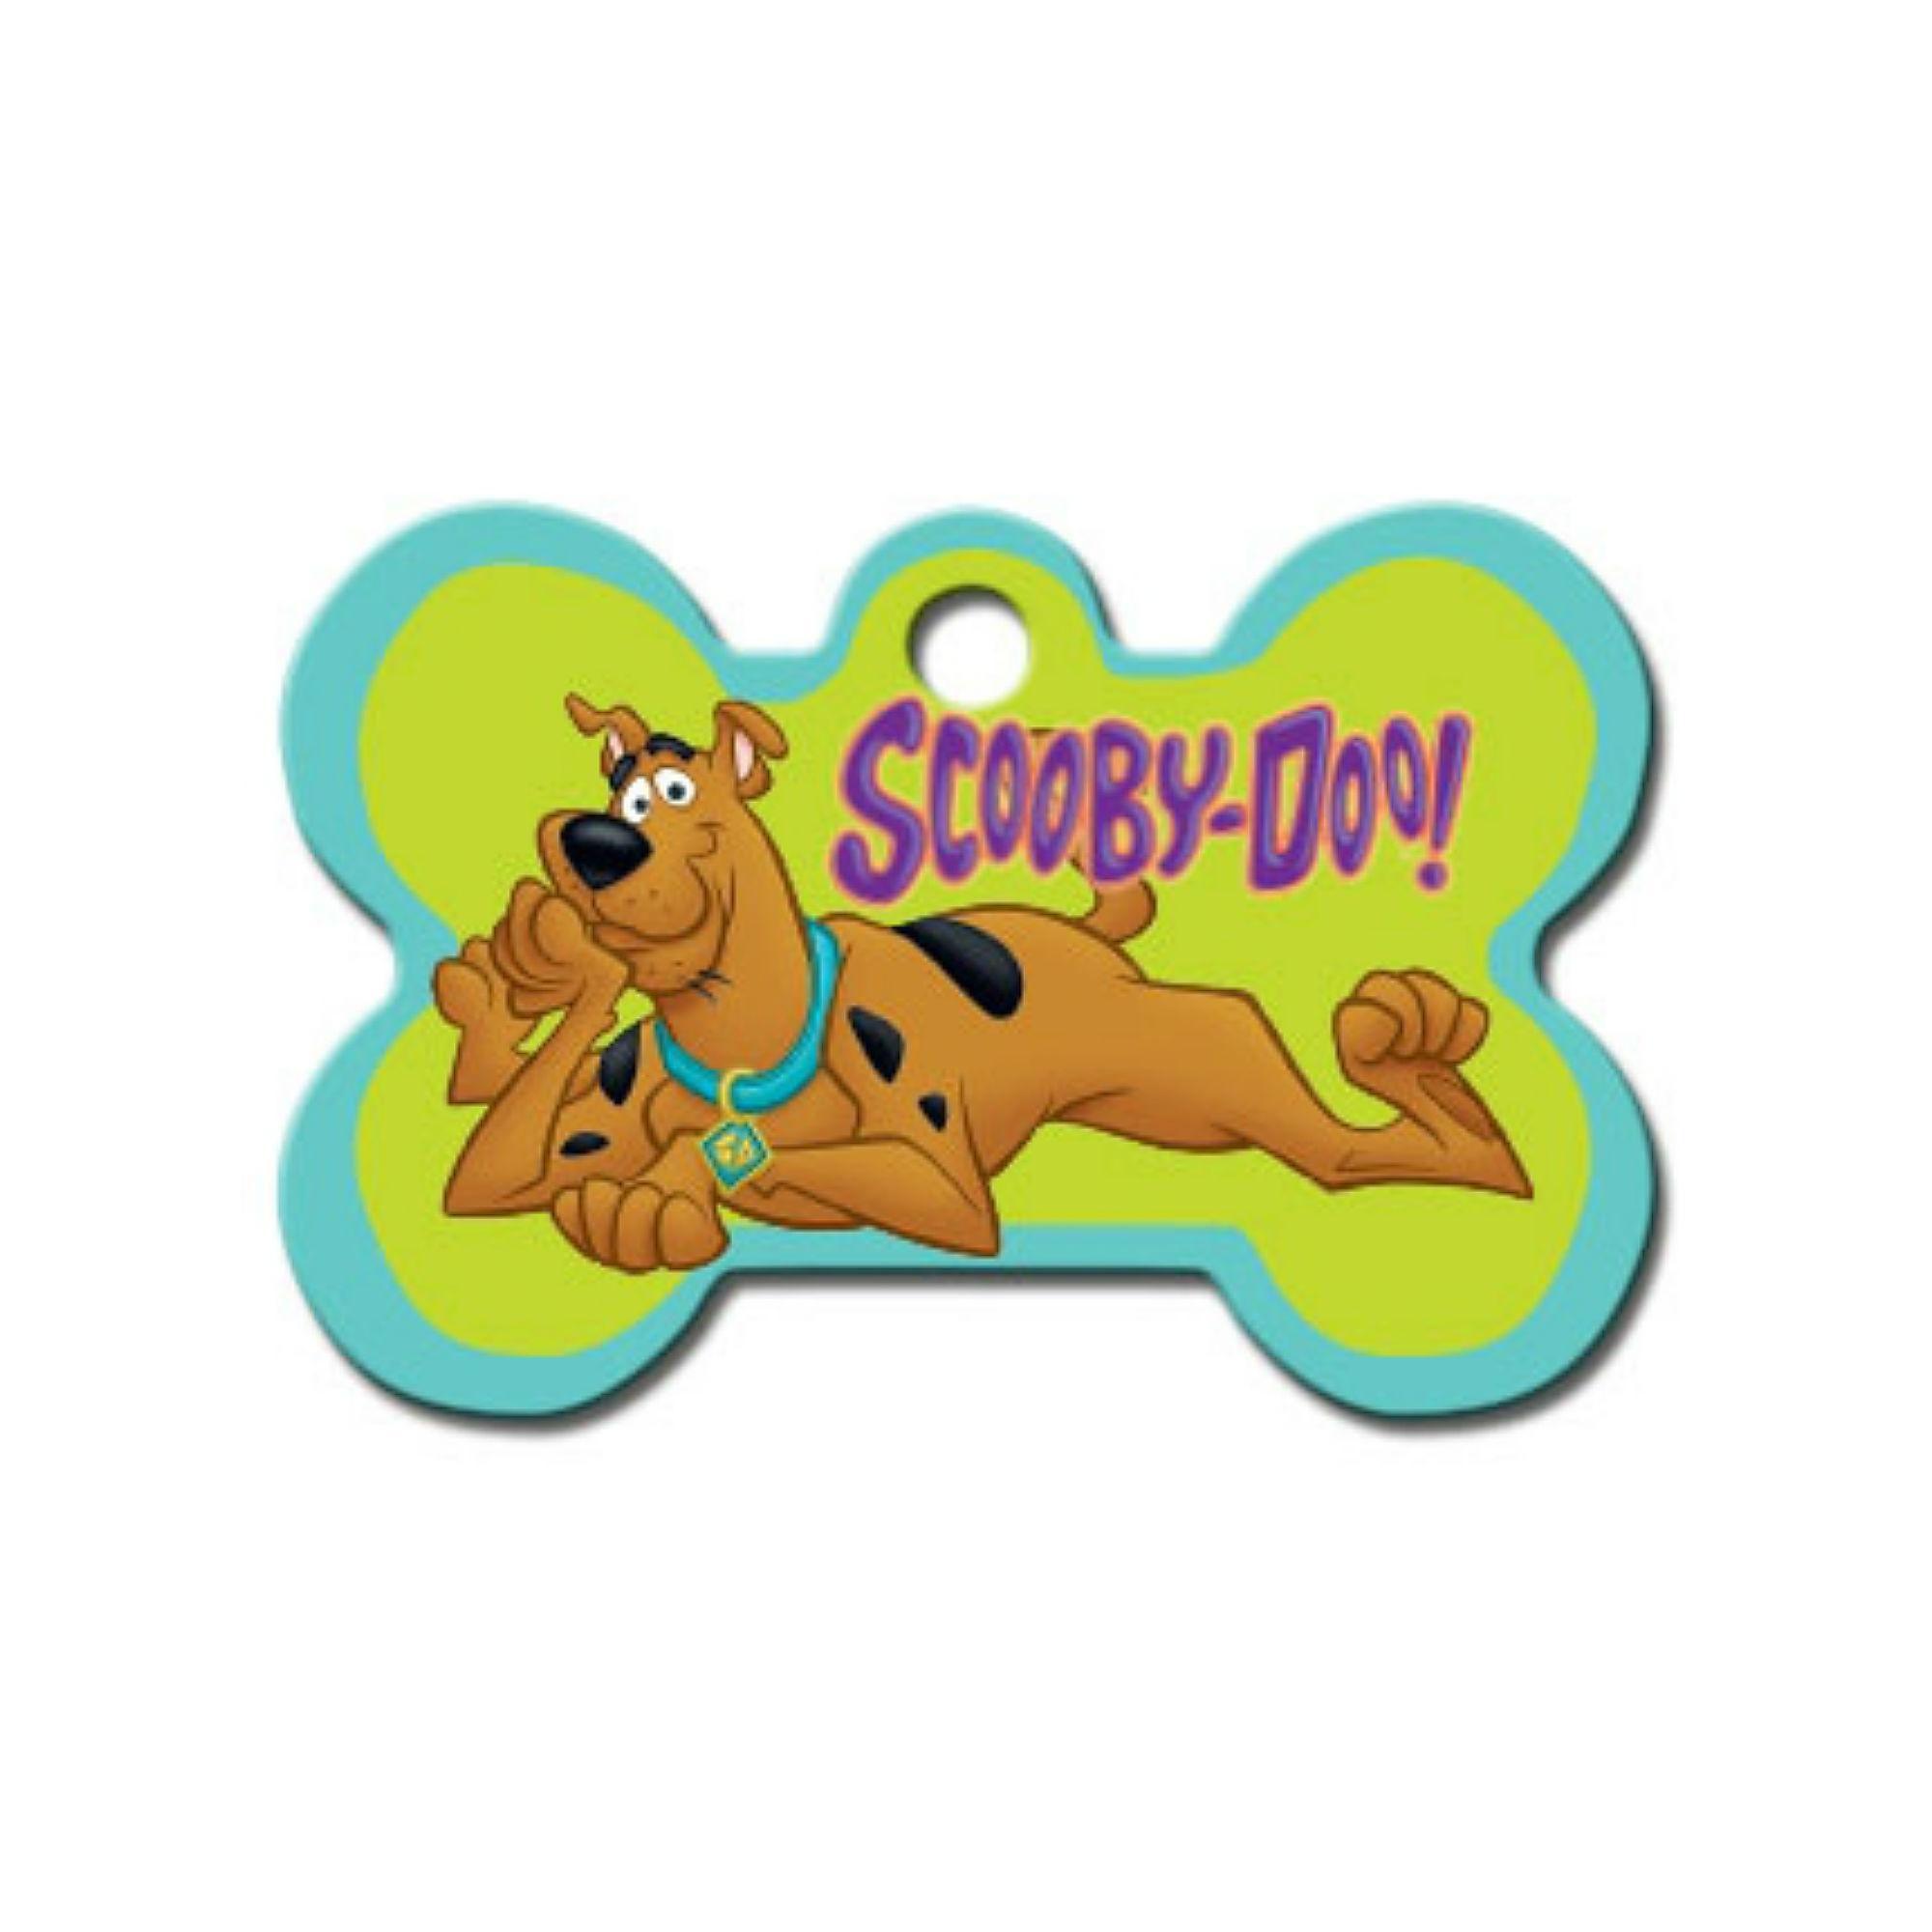 Scooby Doo Bone Large Engravable Pet I.D. Tag